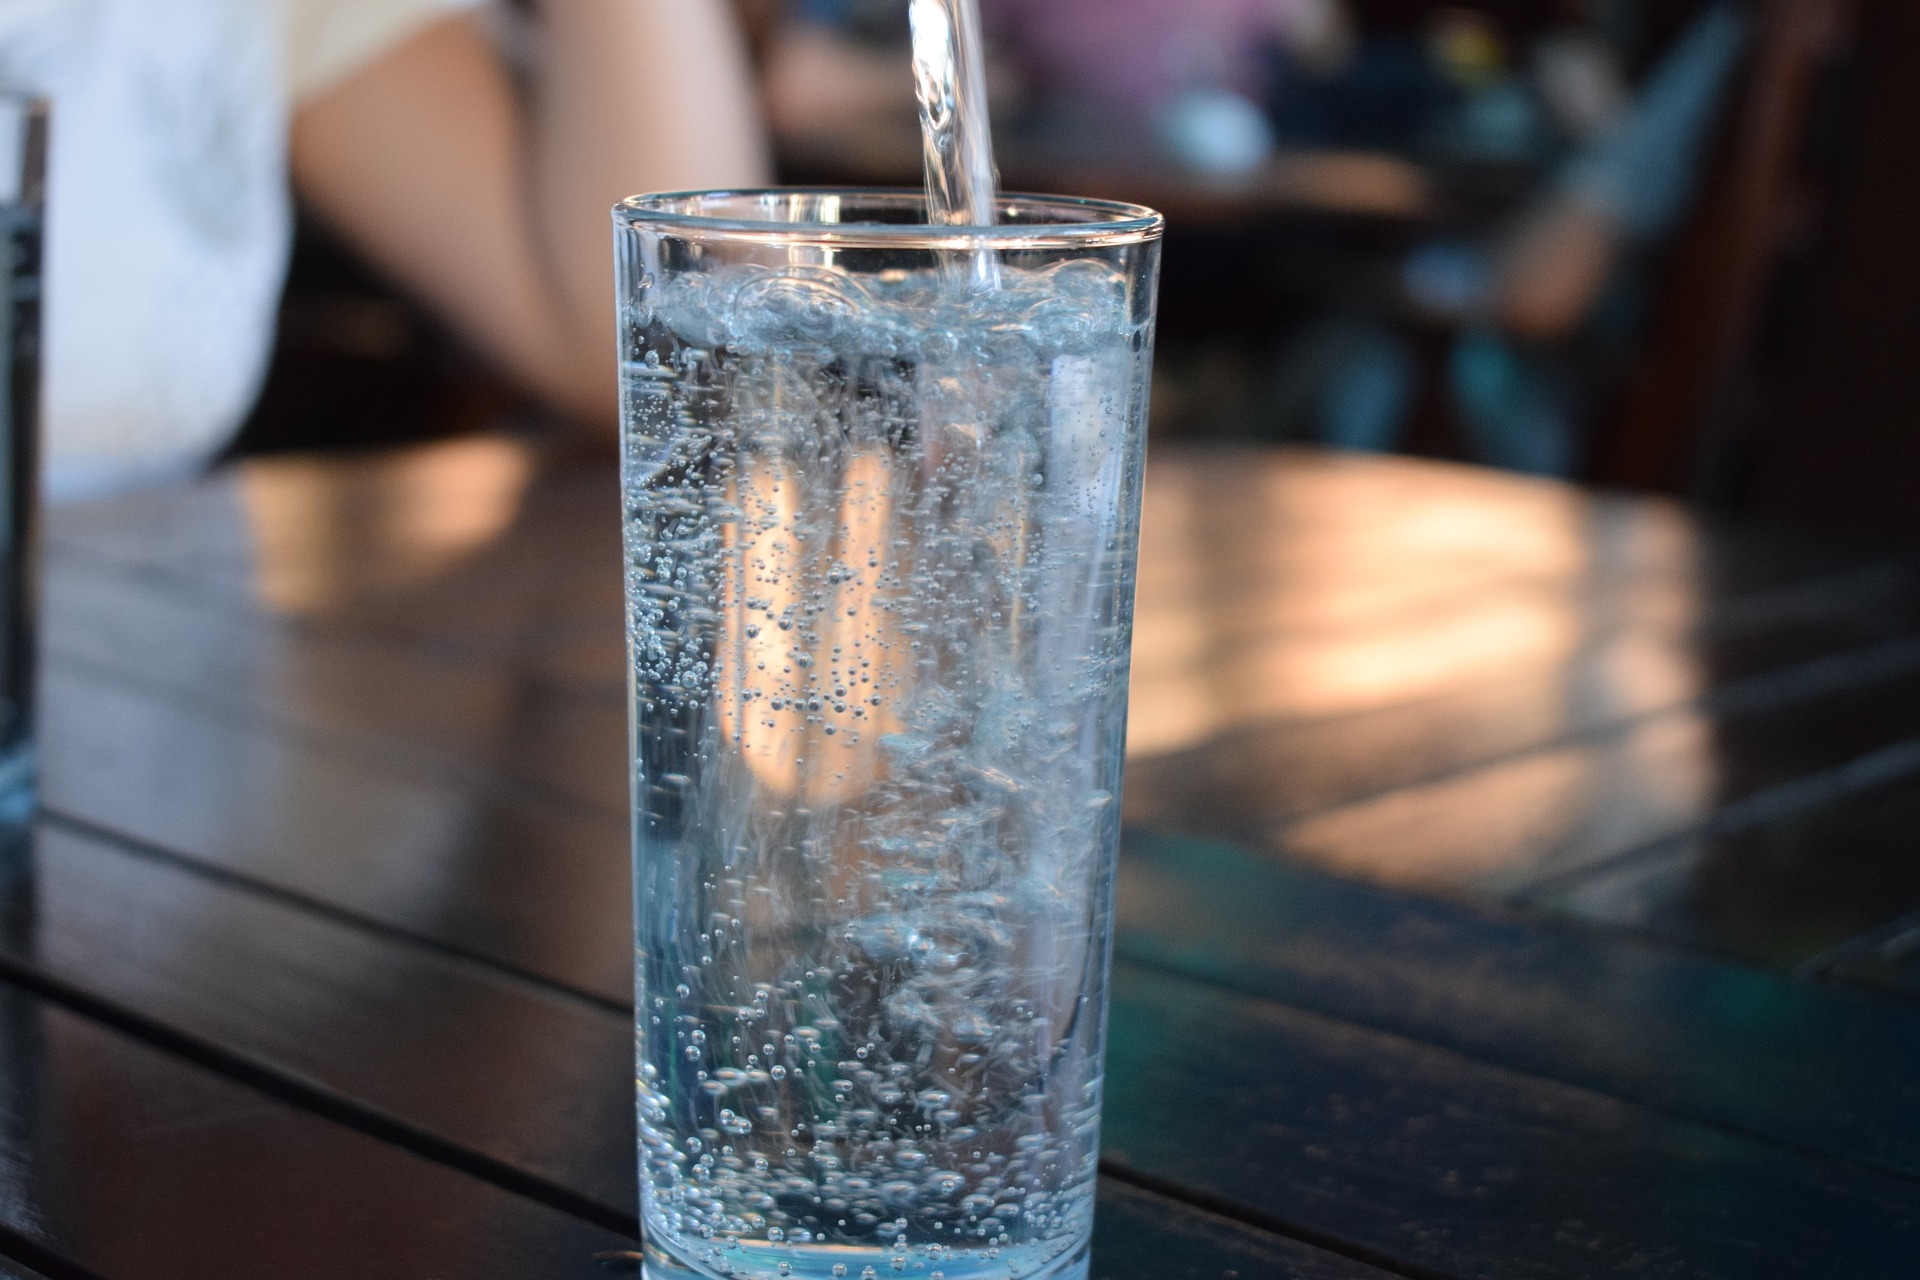 De ce e bine sa bei apa dimineata